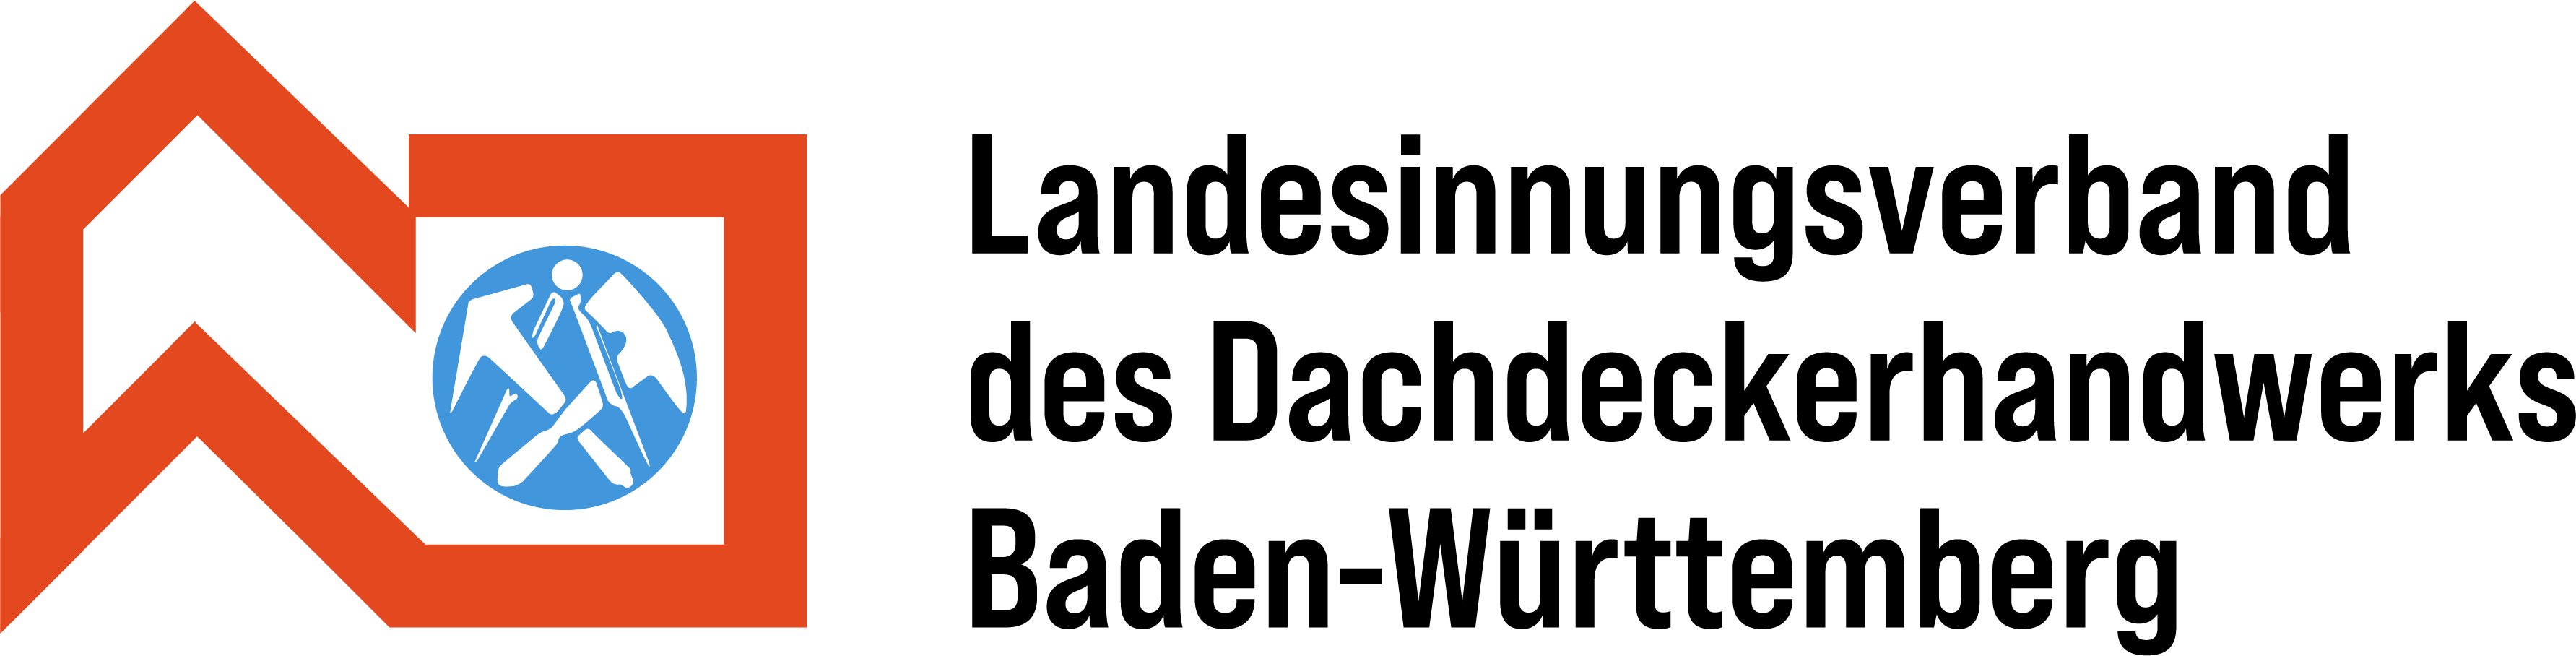 Landesinnungsverband des Dachdeckerhandwerks Baden-Württemberg